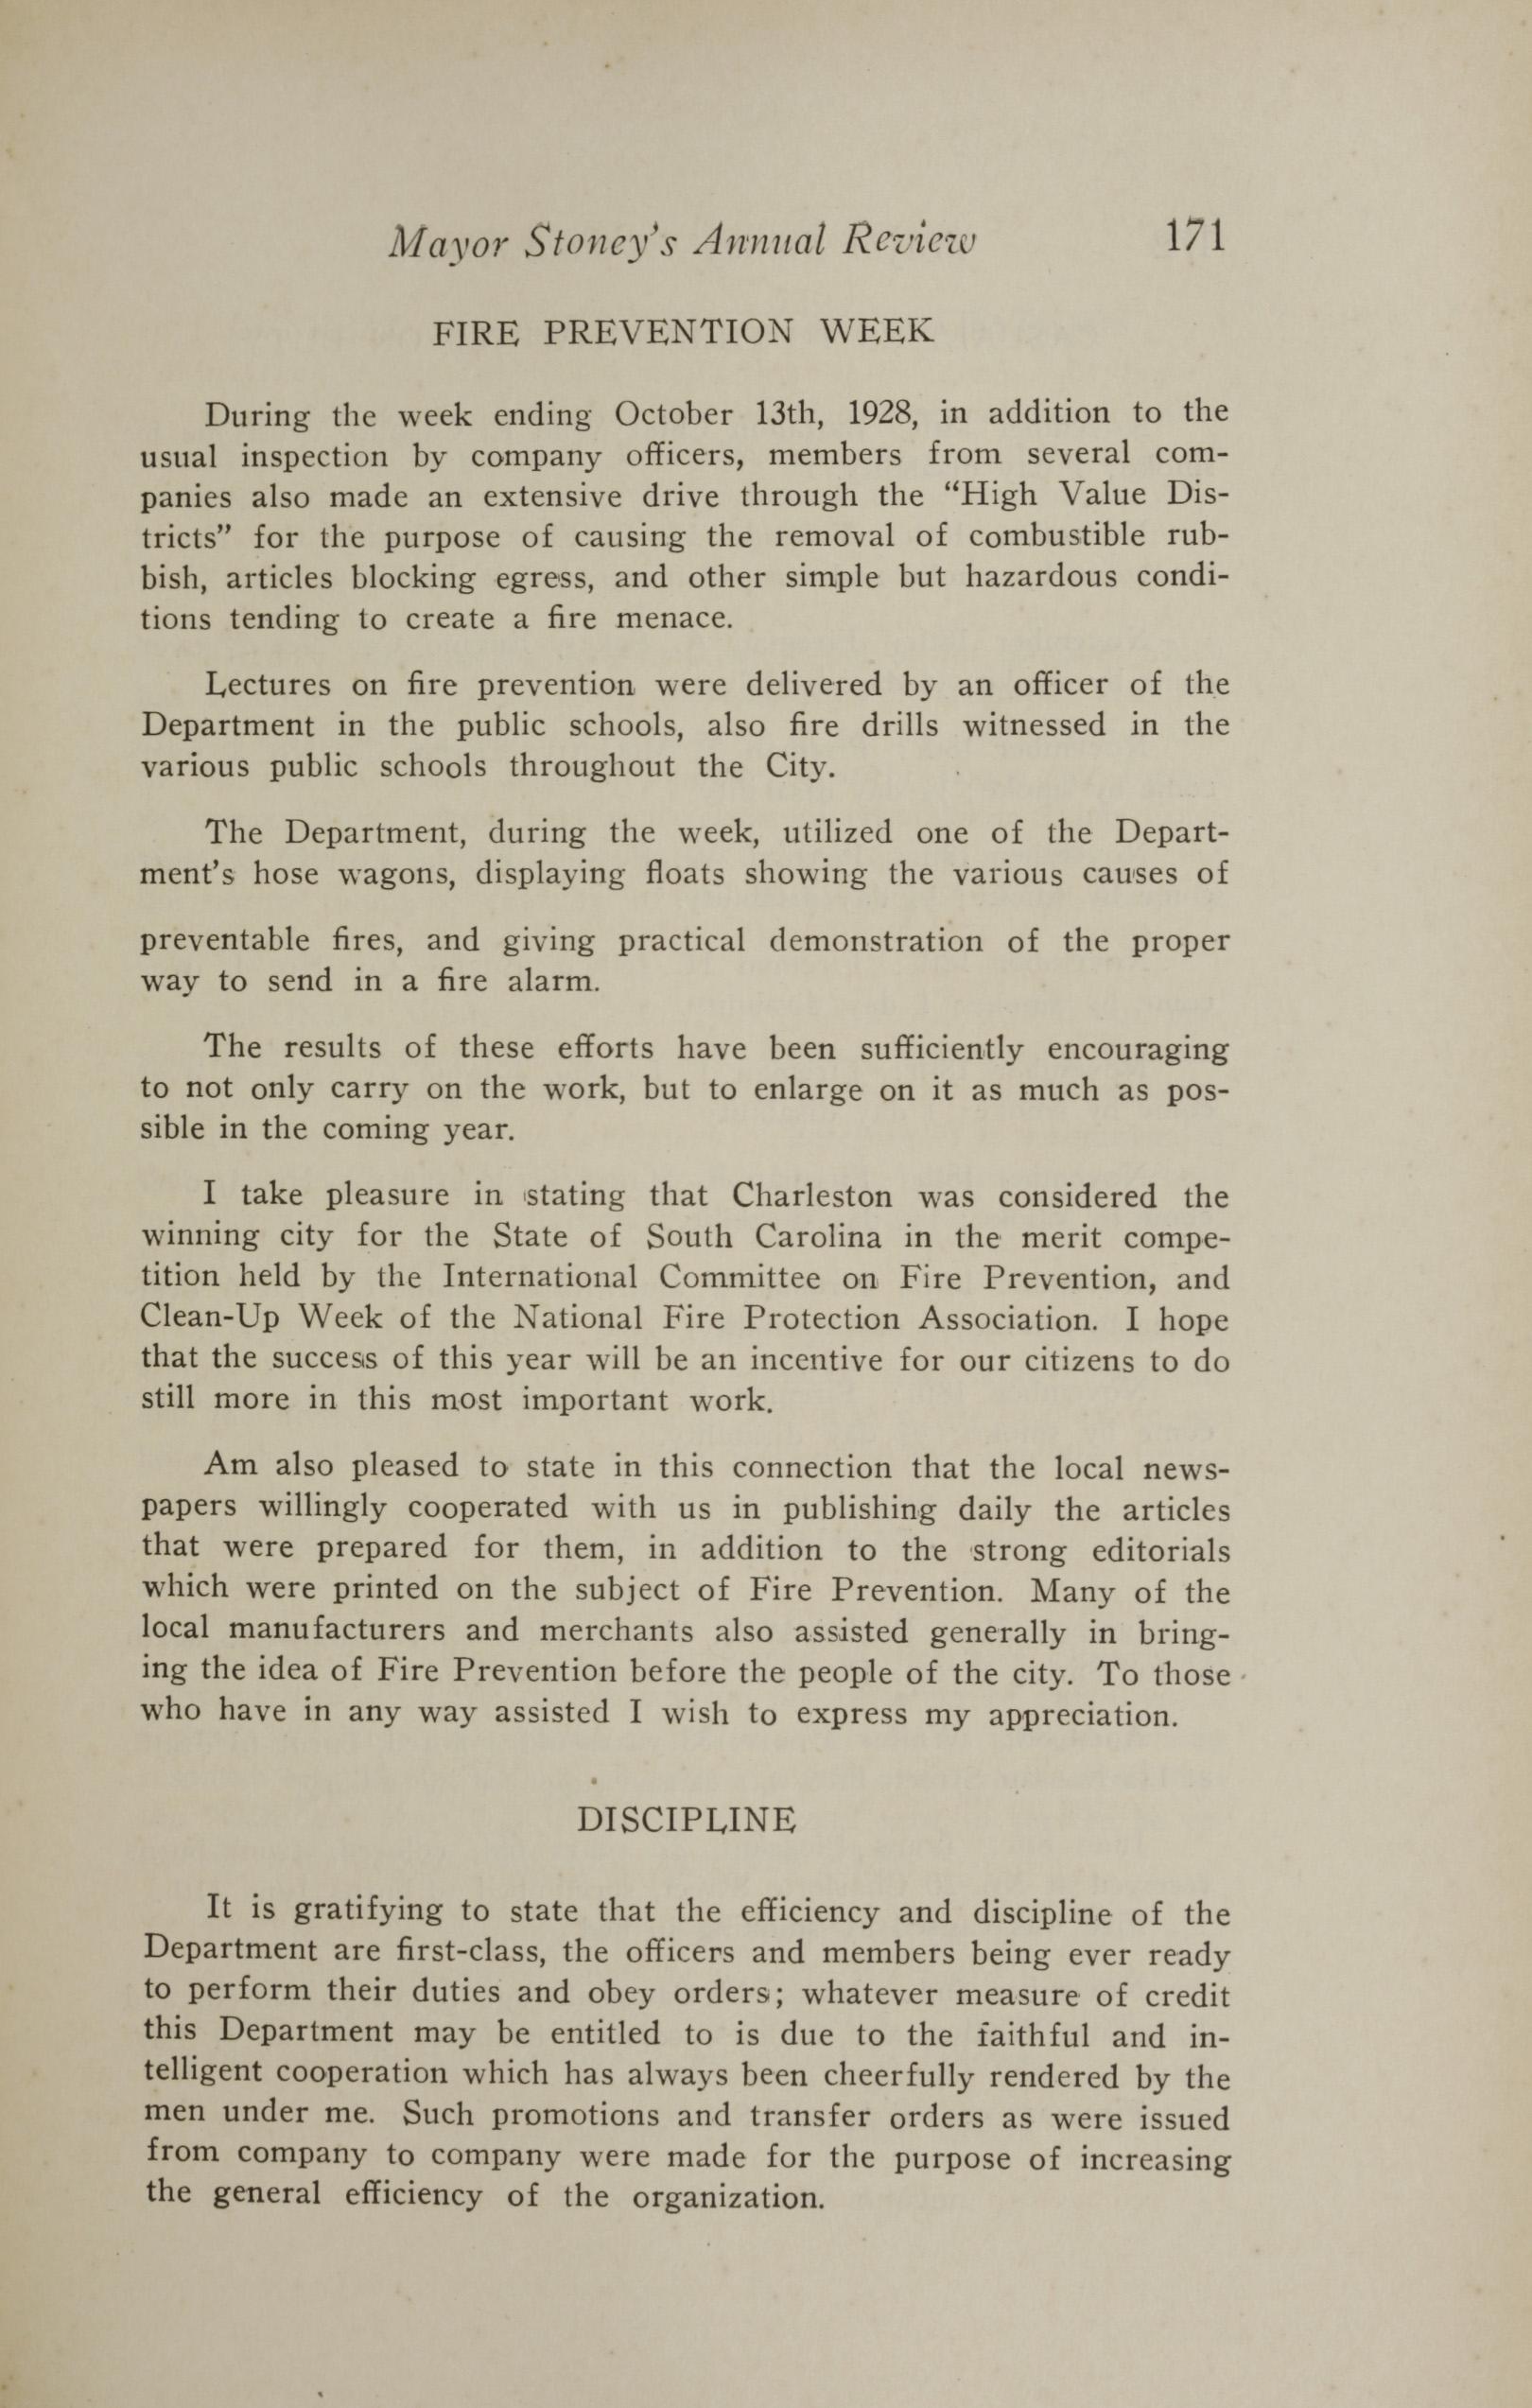 Charleston Yearbook, 1928, page 171